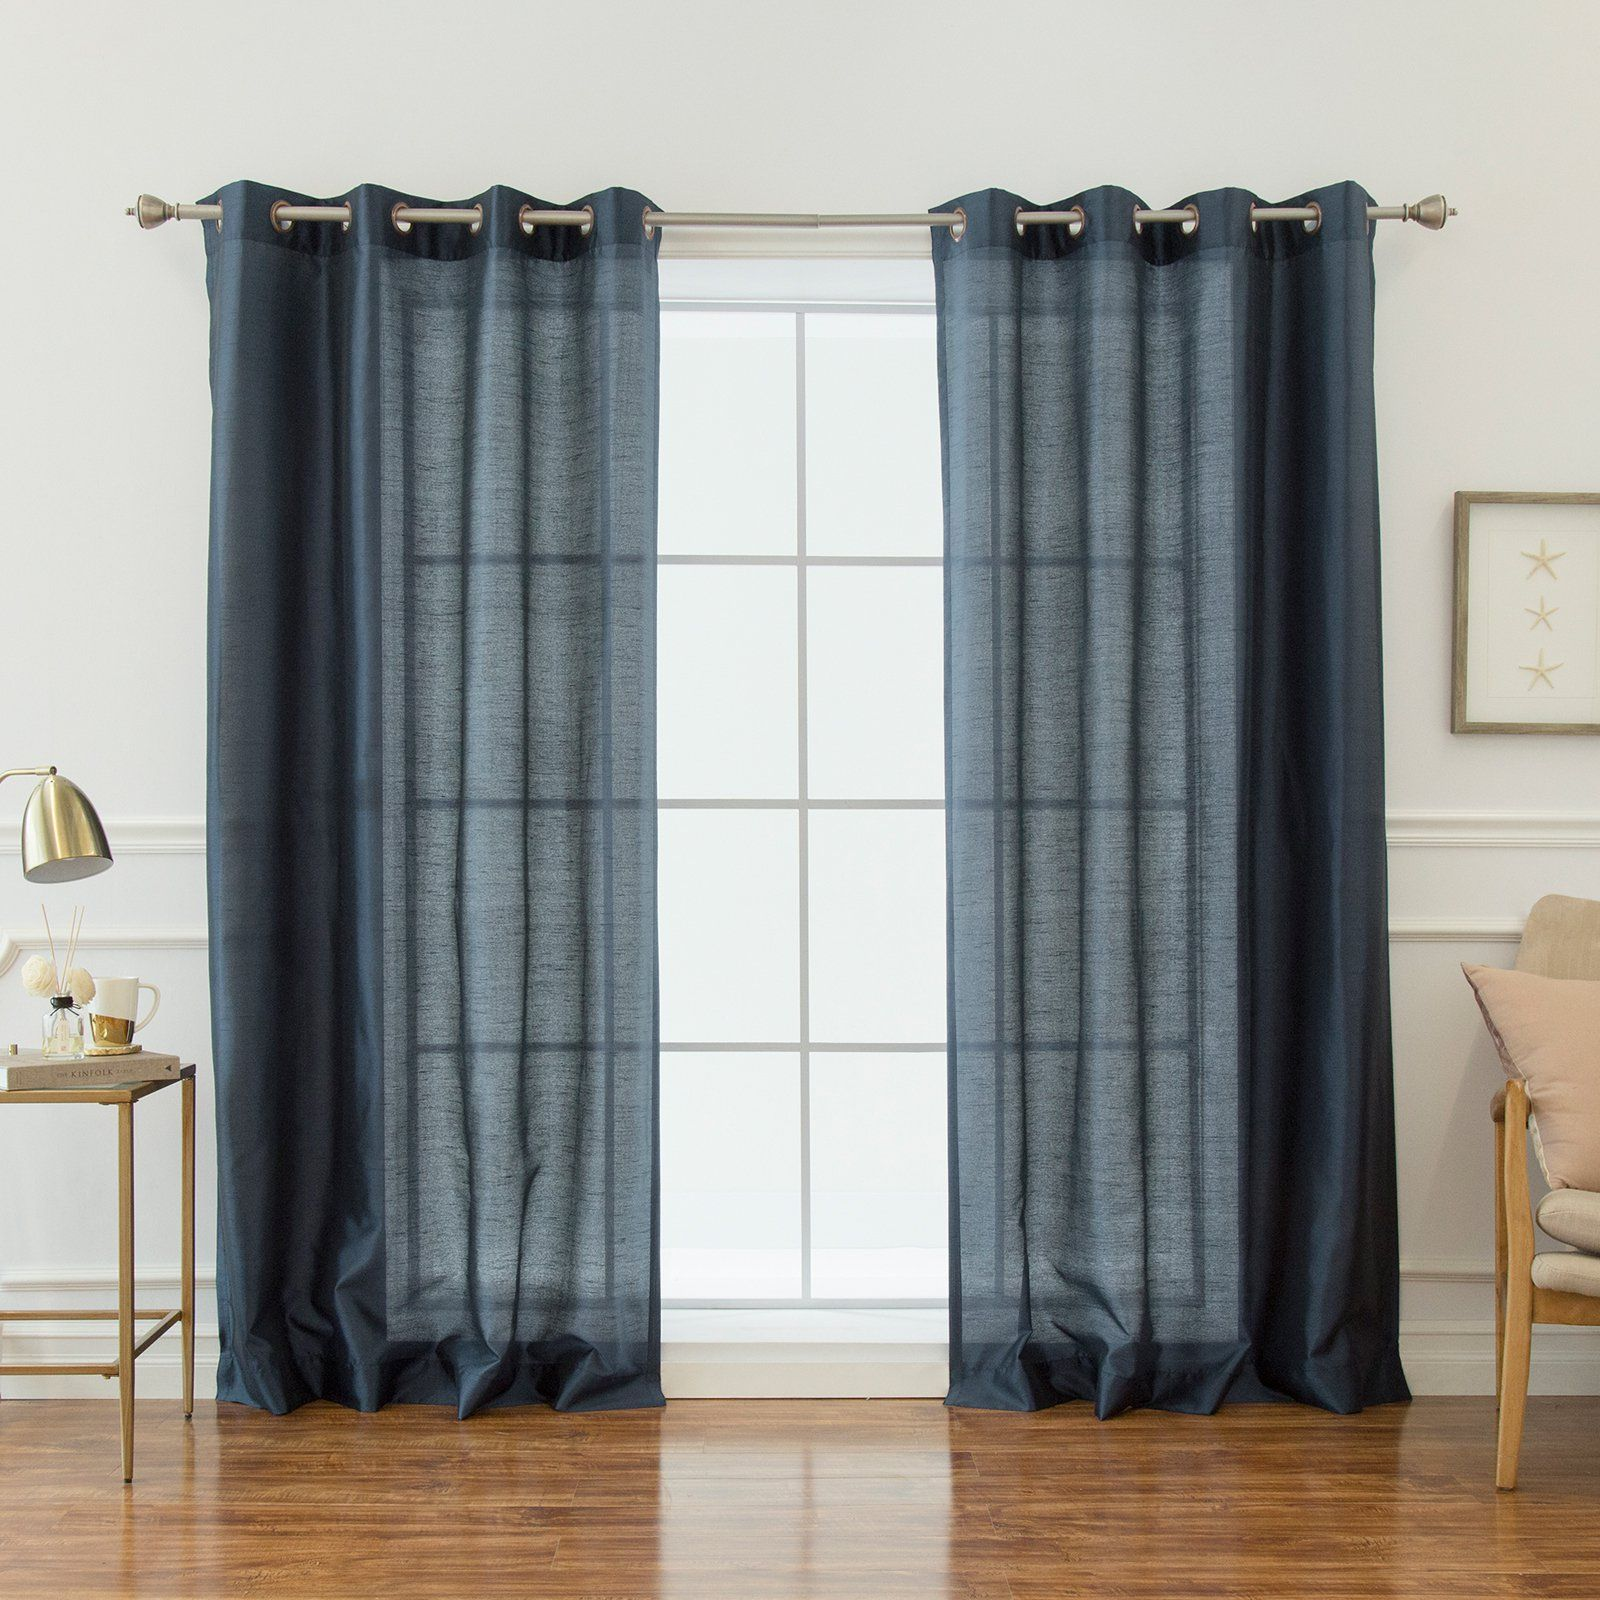 textiles silk natural curtain linen curtains fabric designed